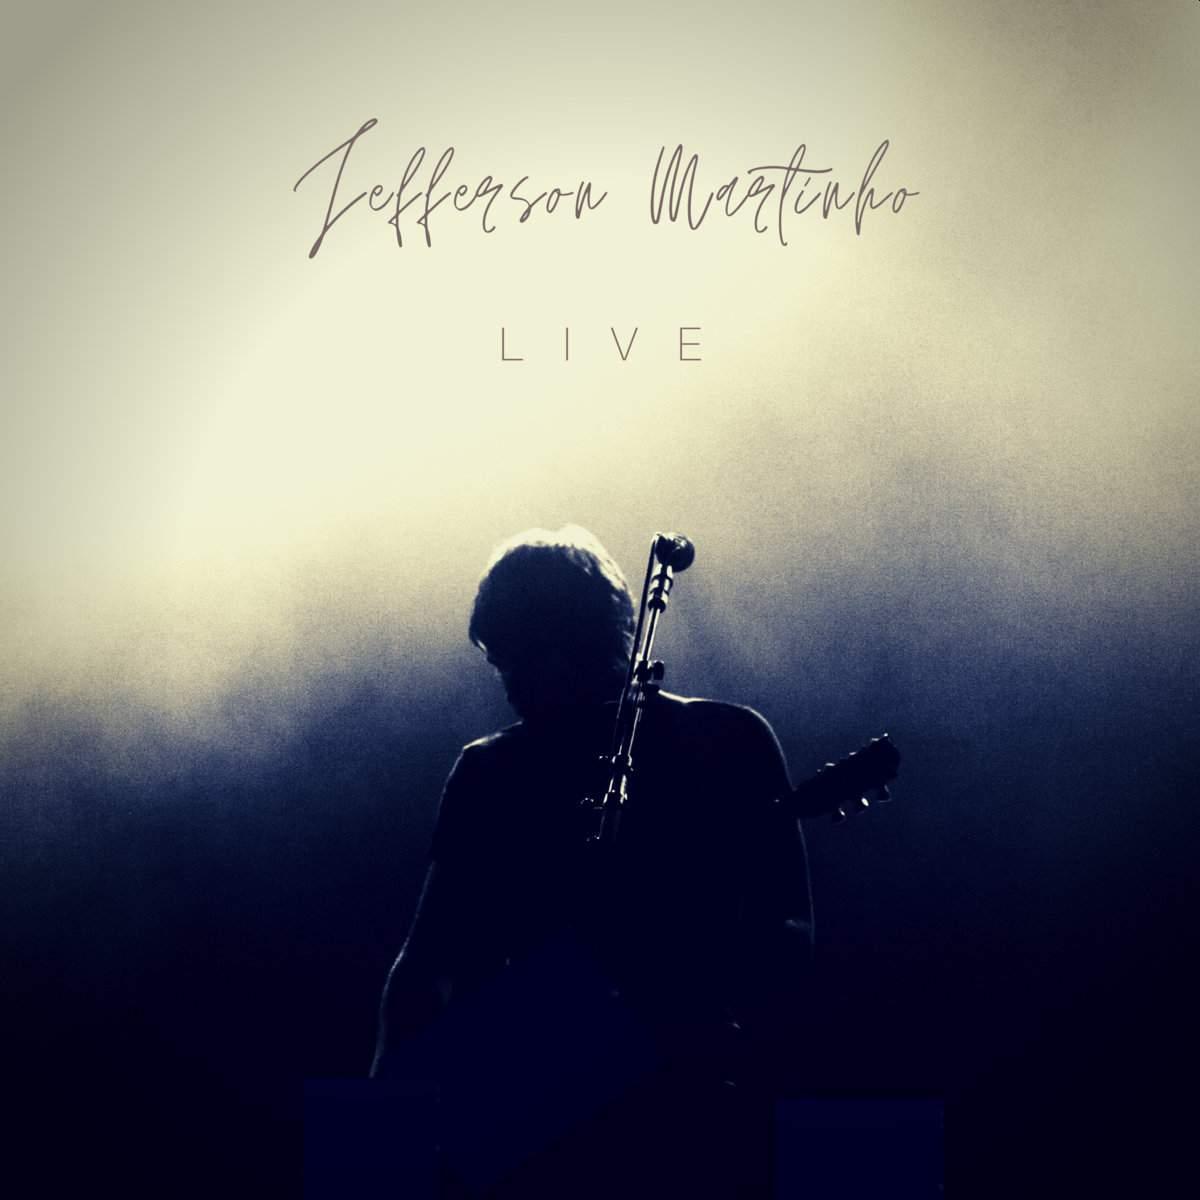 Jefferson Martinho - Live